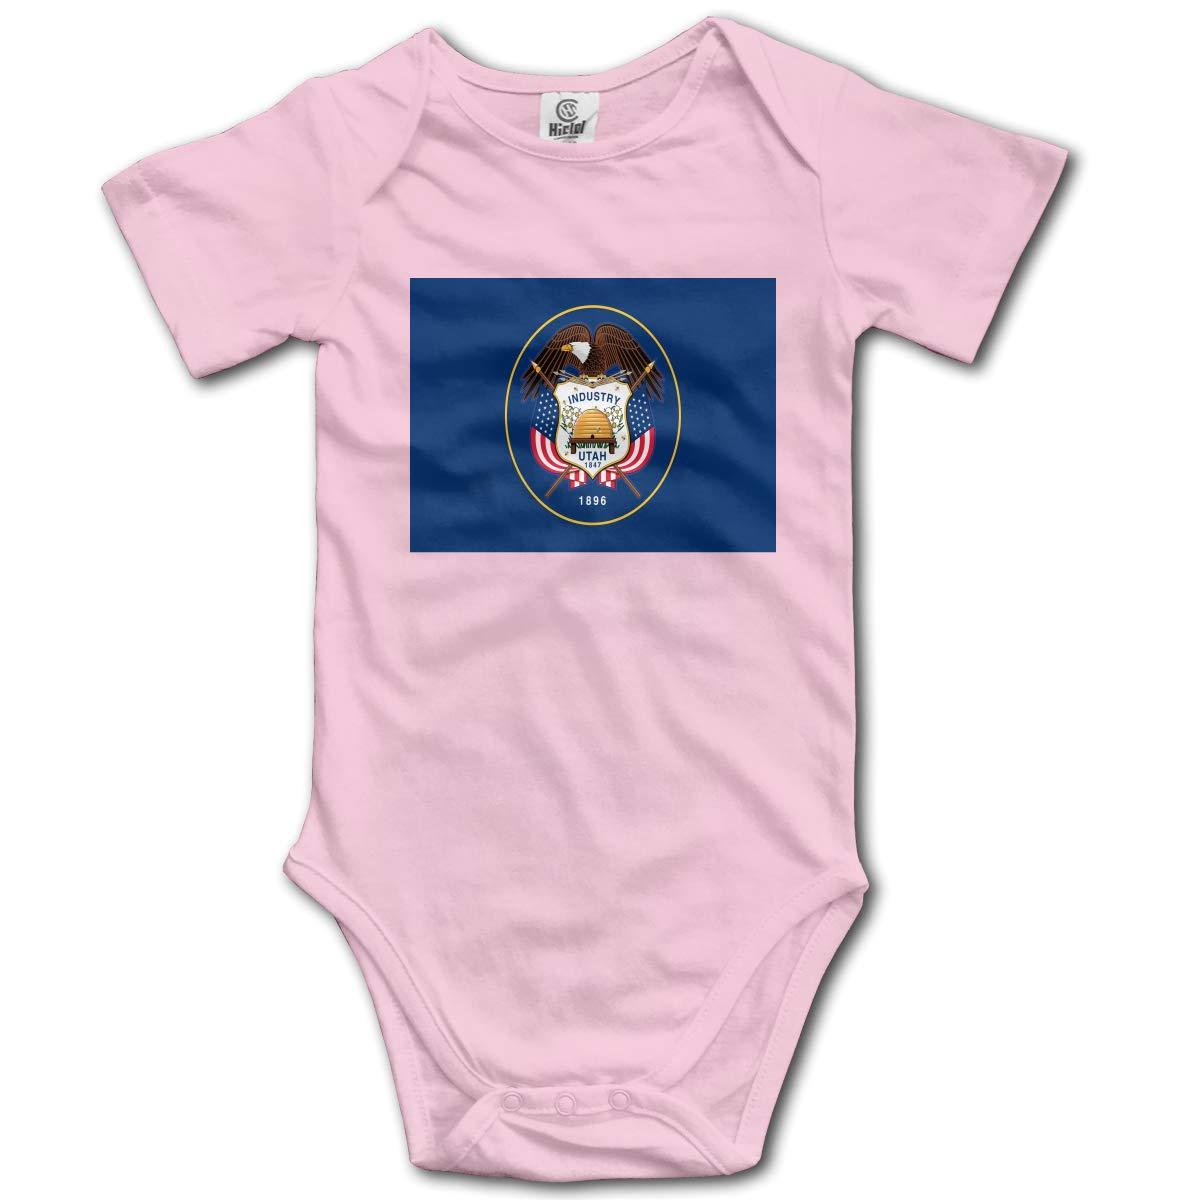 CUTEDWARF Baby Short-Sleeve Onesies Utah State Flag Bodysuit Baby Outfits